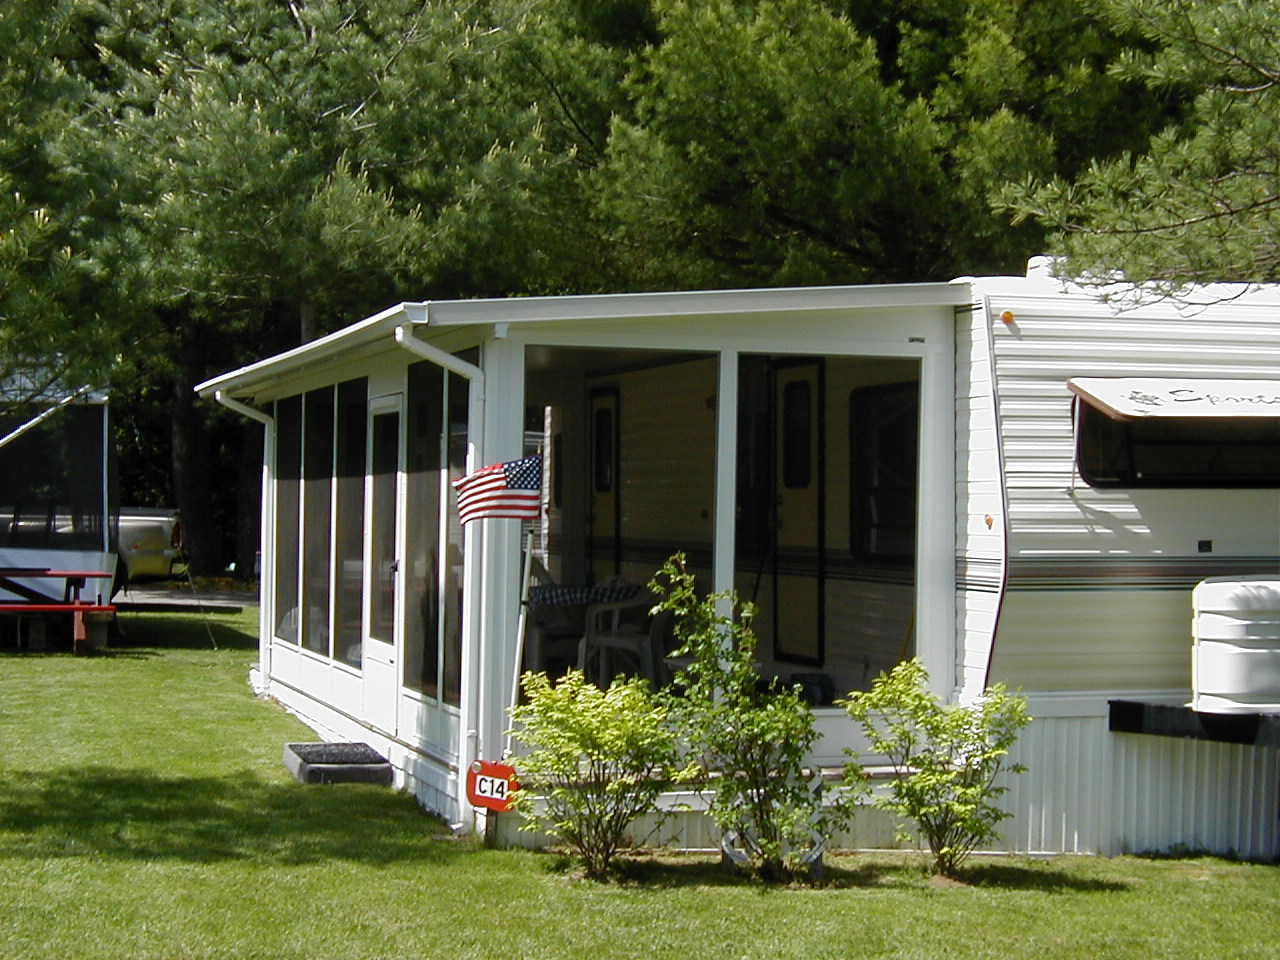 Bill S Rv Service Camper Amp Rv Specialist Since 1978